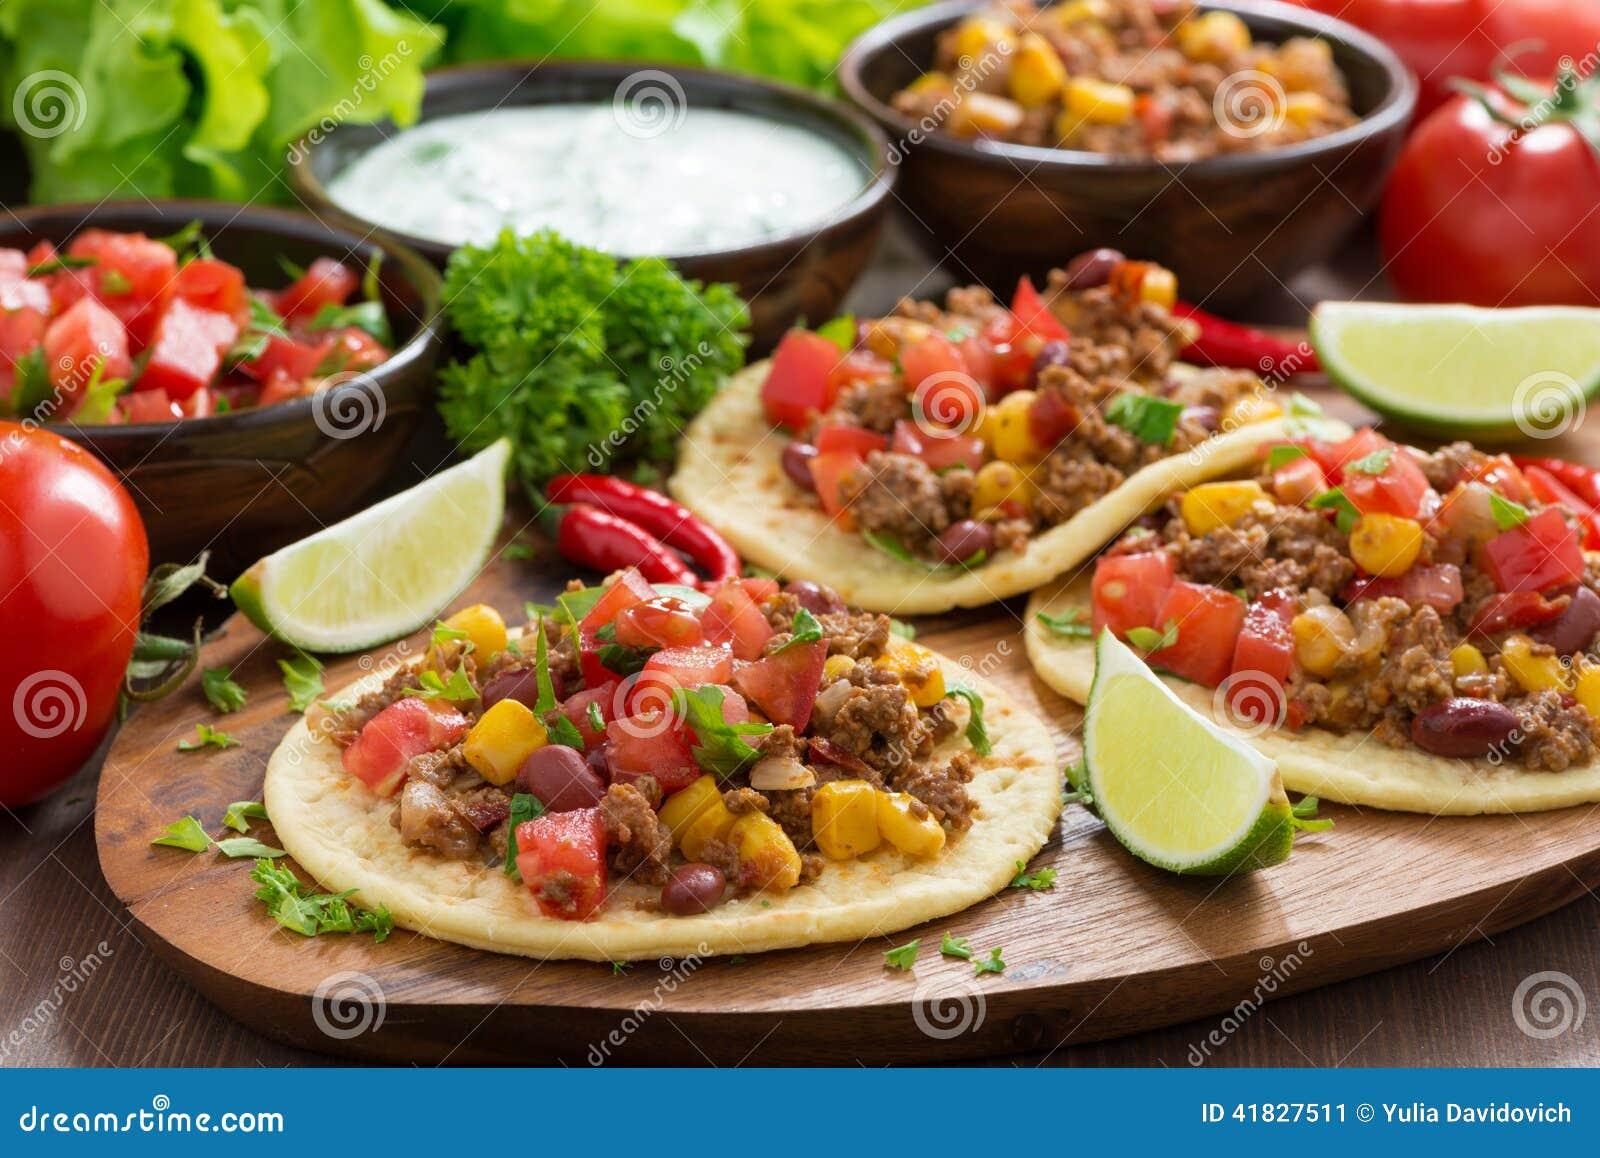 Cuisine mexicaine images for Cuisine mexicaine